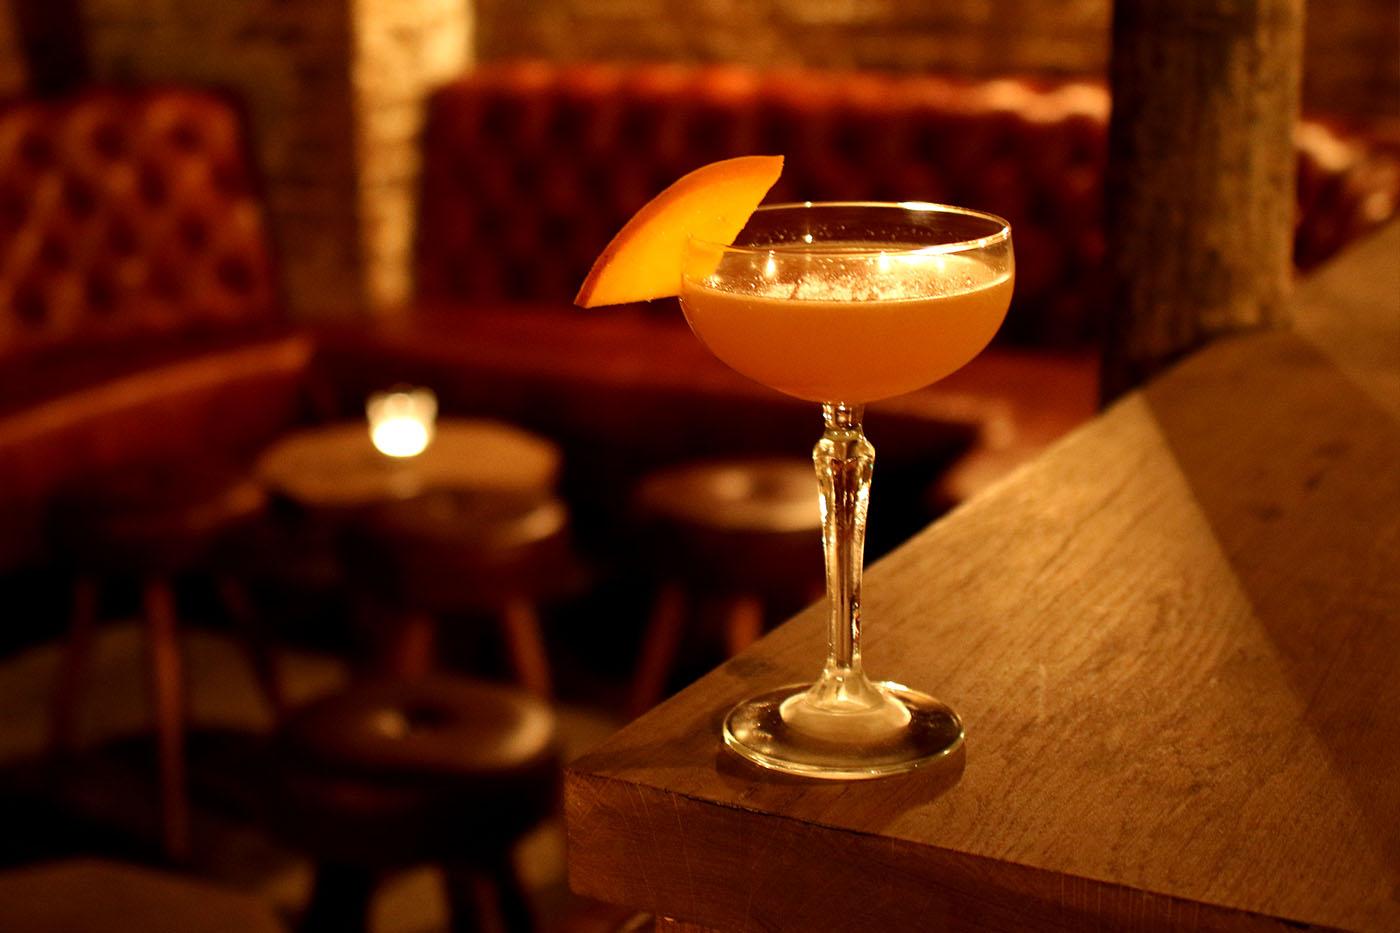 tt-liquor-cellar-cocktail-bar-shoreditch-east-london-09-cocktail-journeys